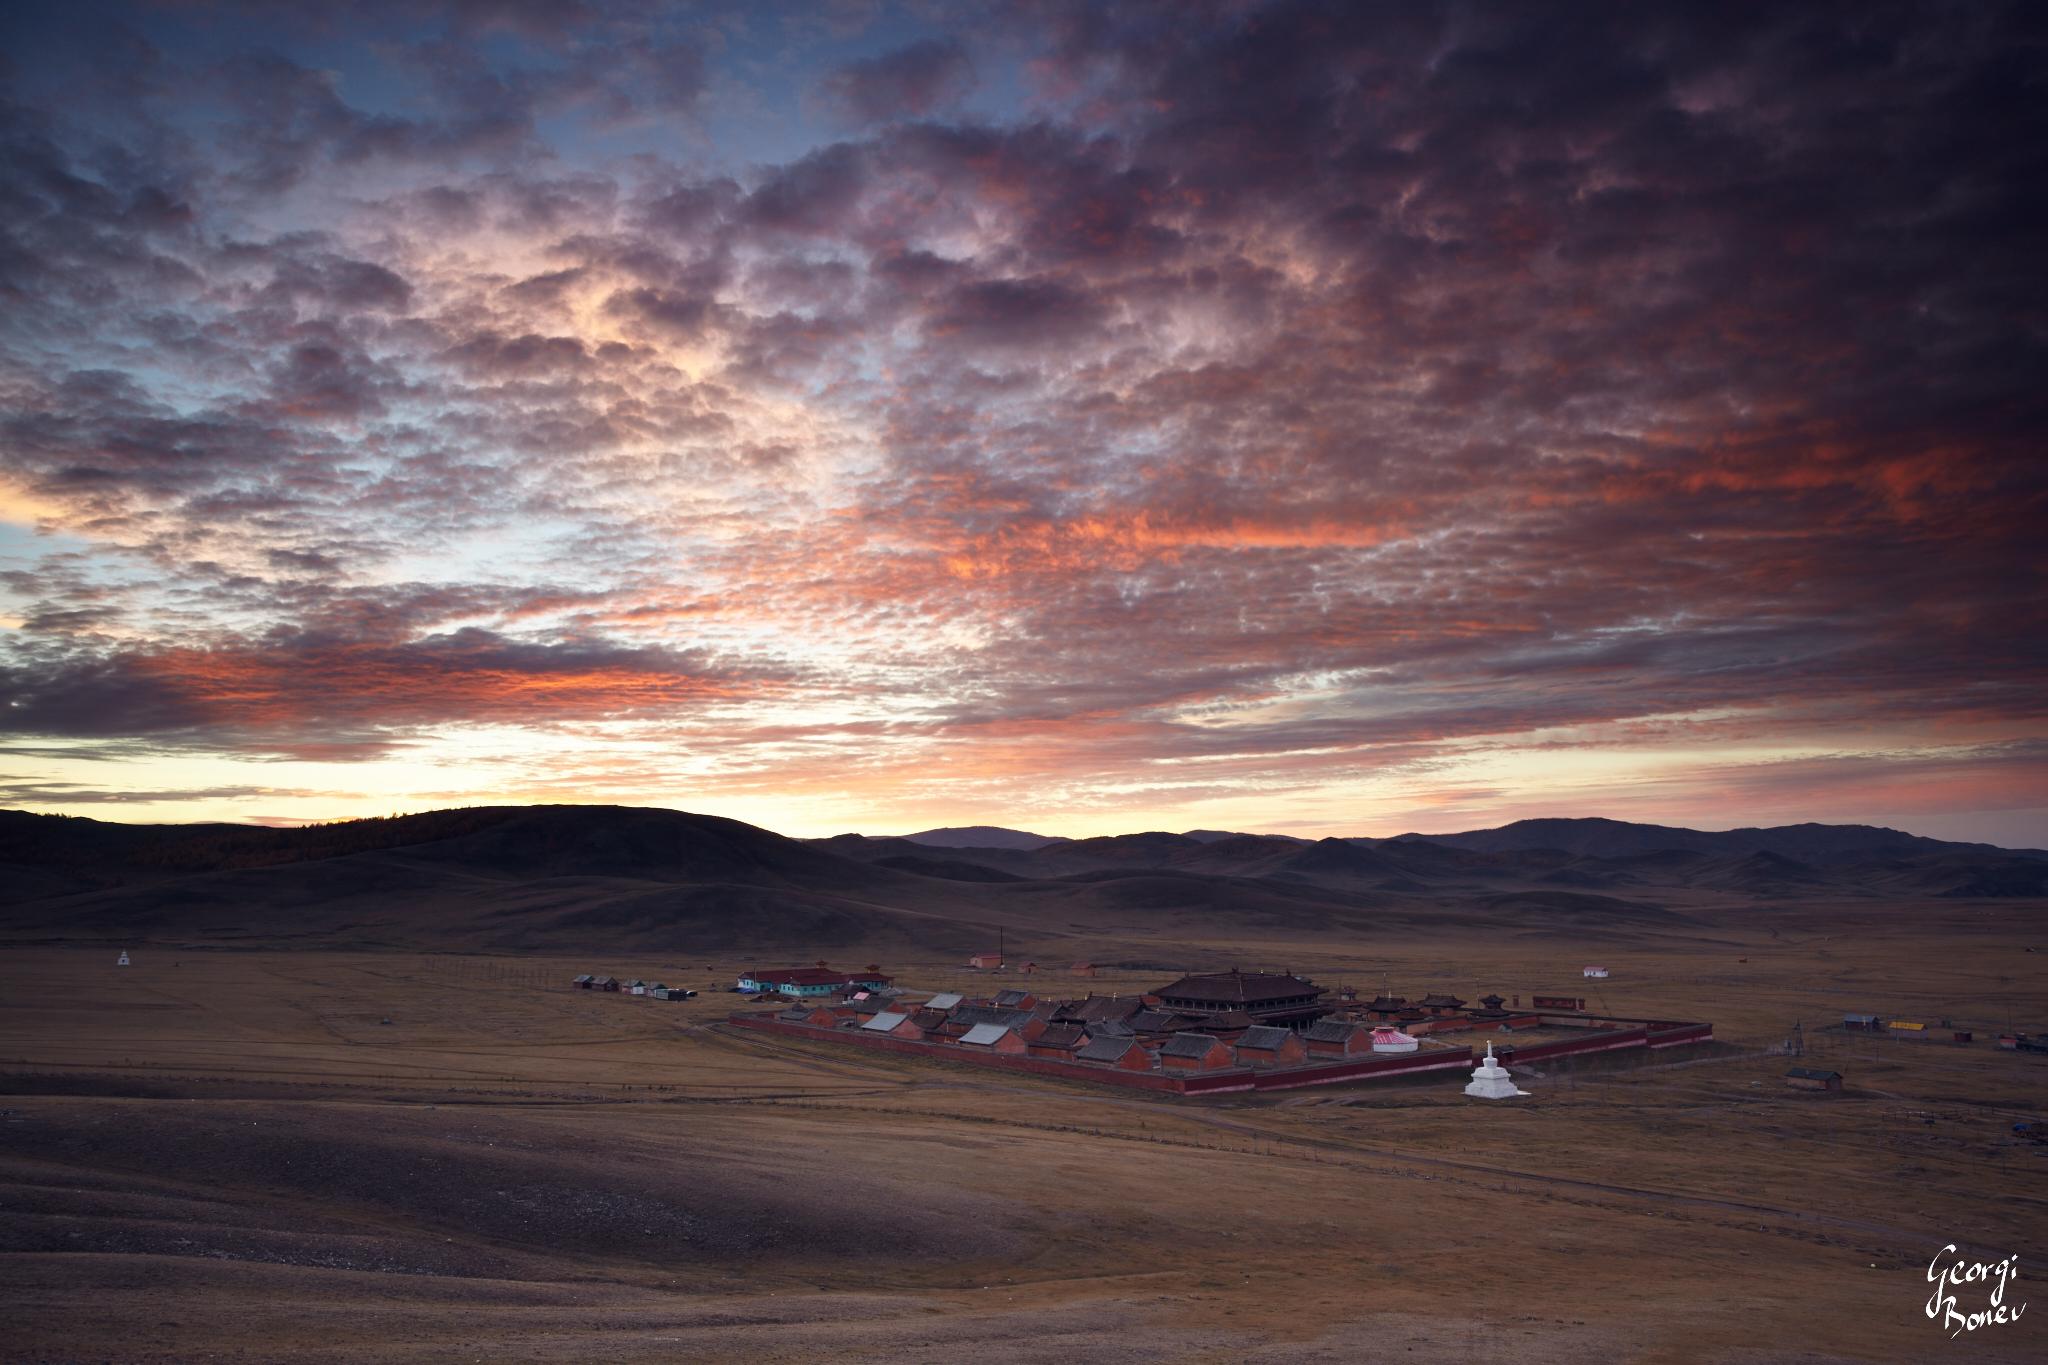 Amarbayasgalant Khiit Monastery in Mongolia